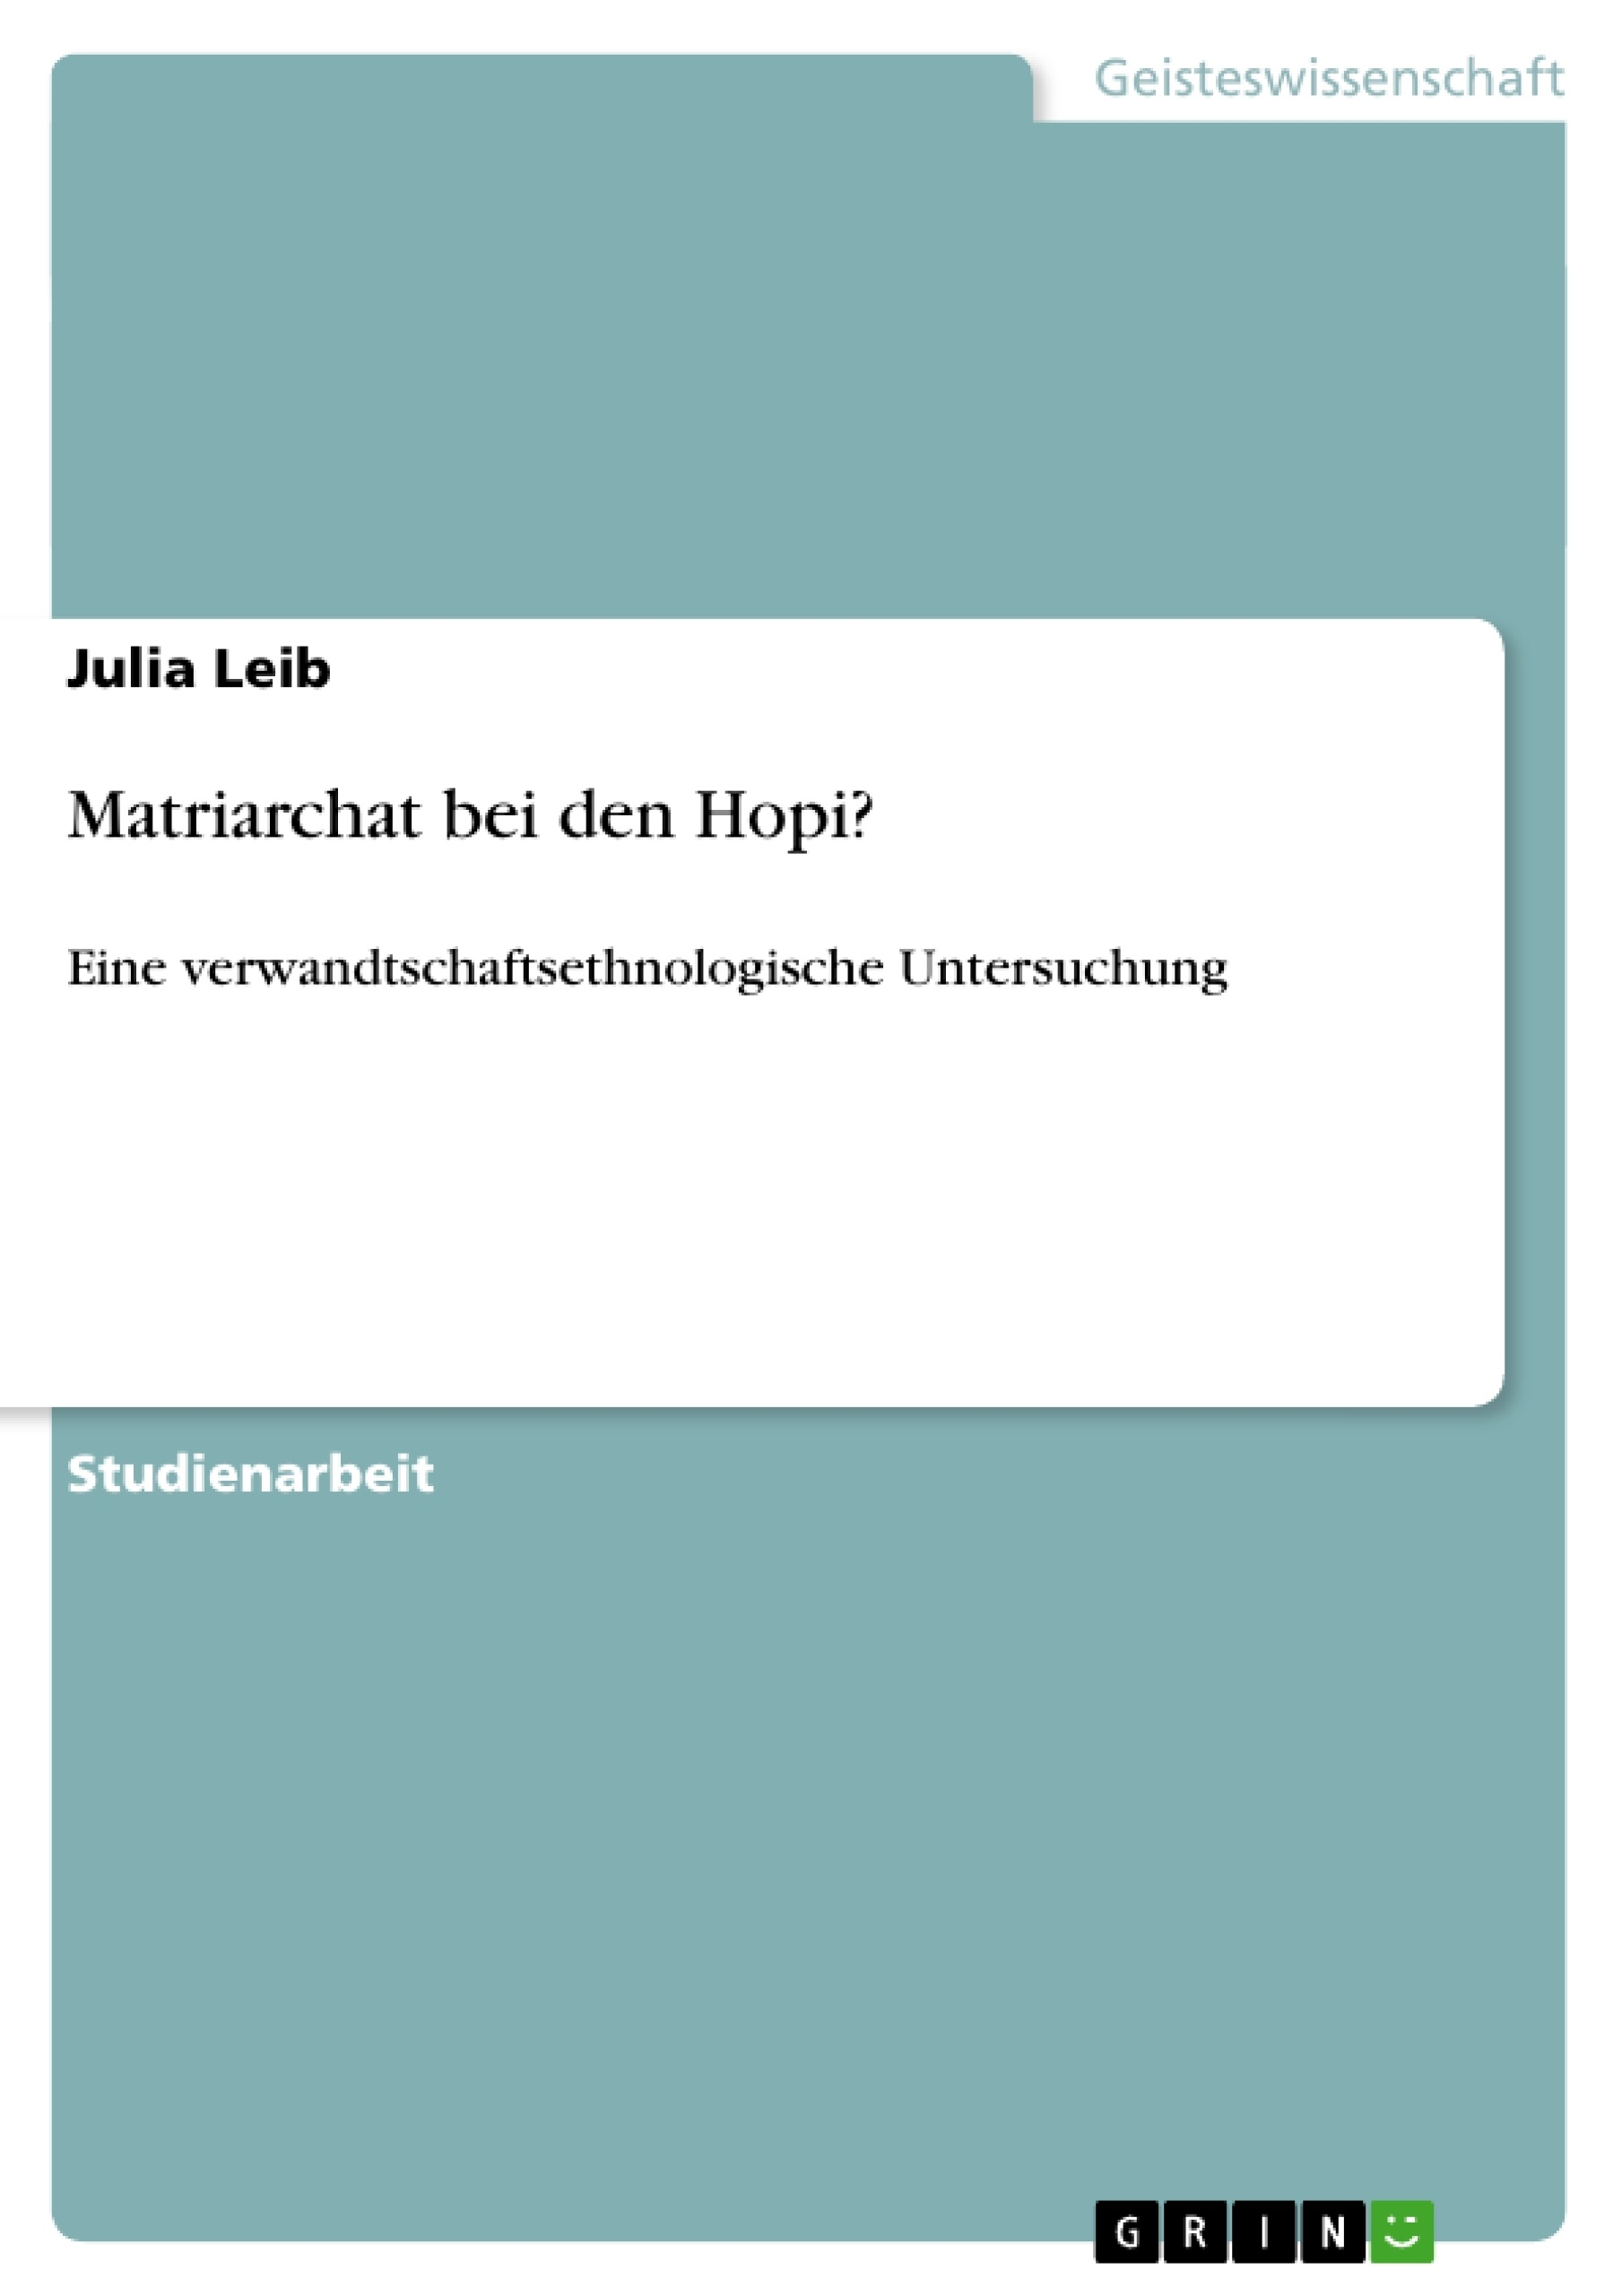 Titel: Matriarchat bei den Hopi?